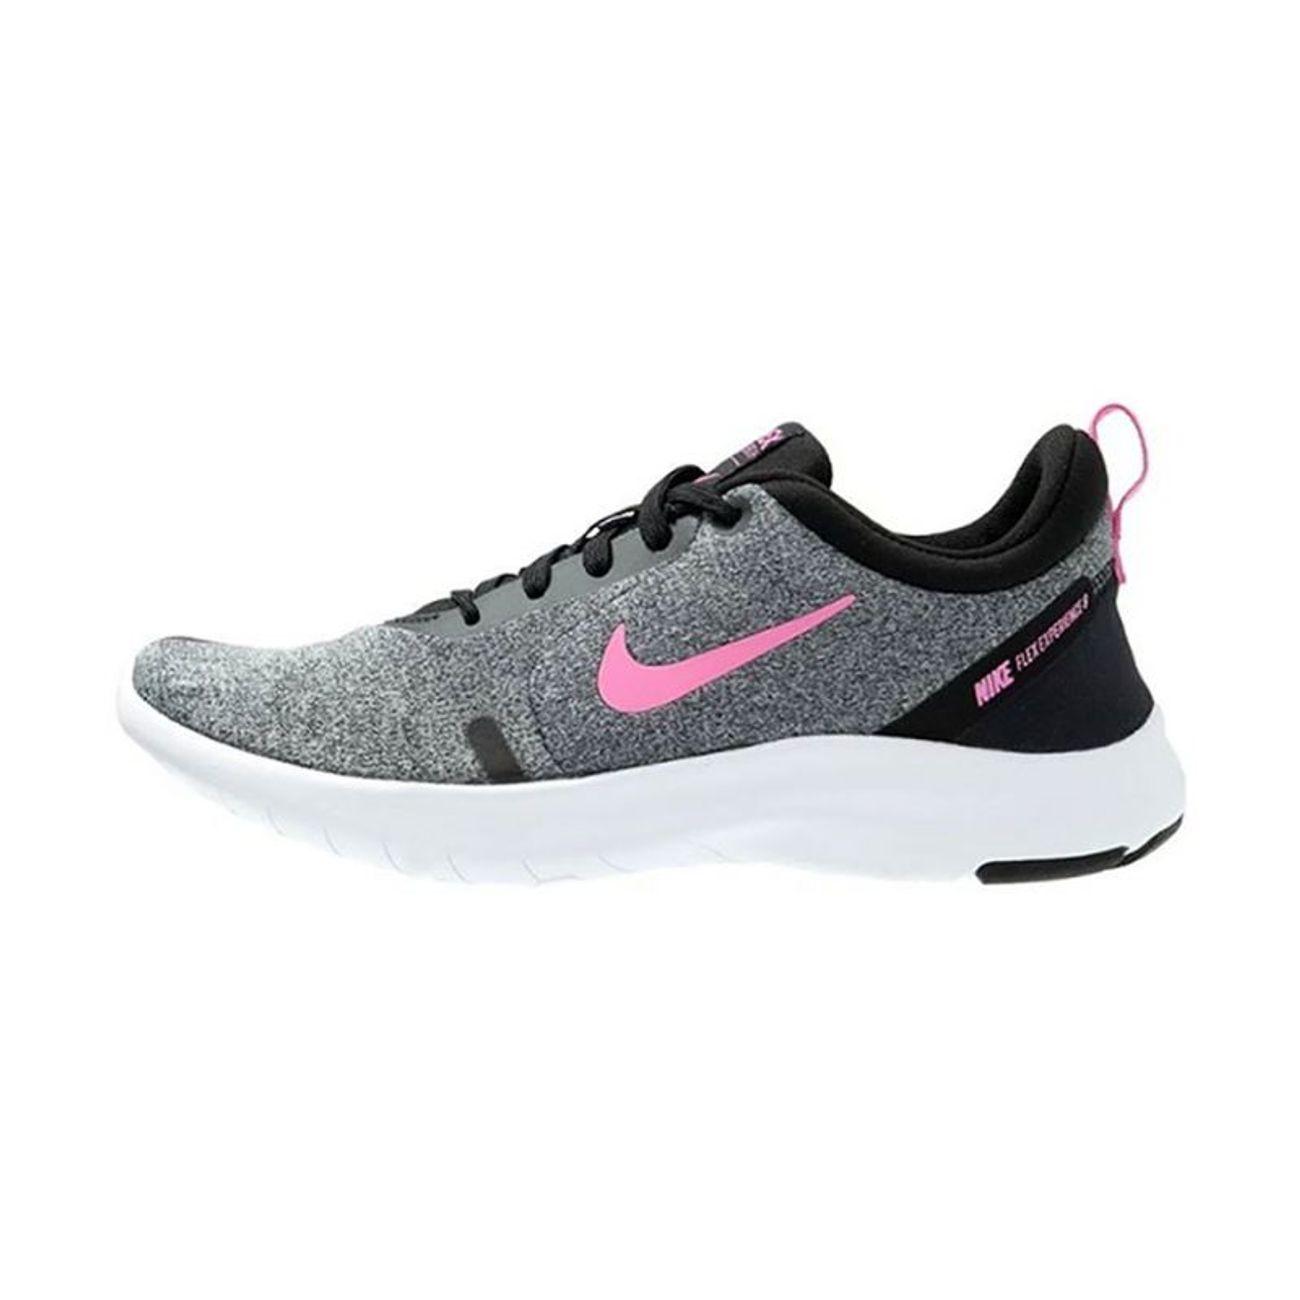 Mujer Experience 8 Padel Adulte Flex 003 Rn Nike Niaj5908 Gris NnOvm8w0